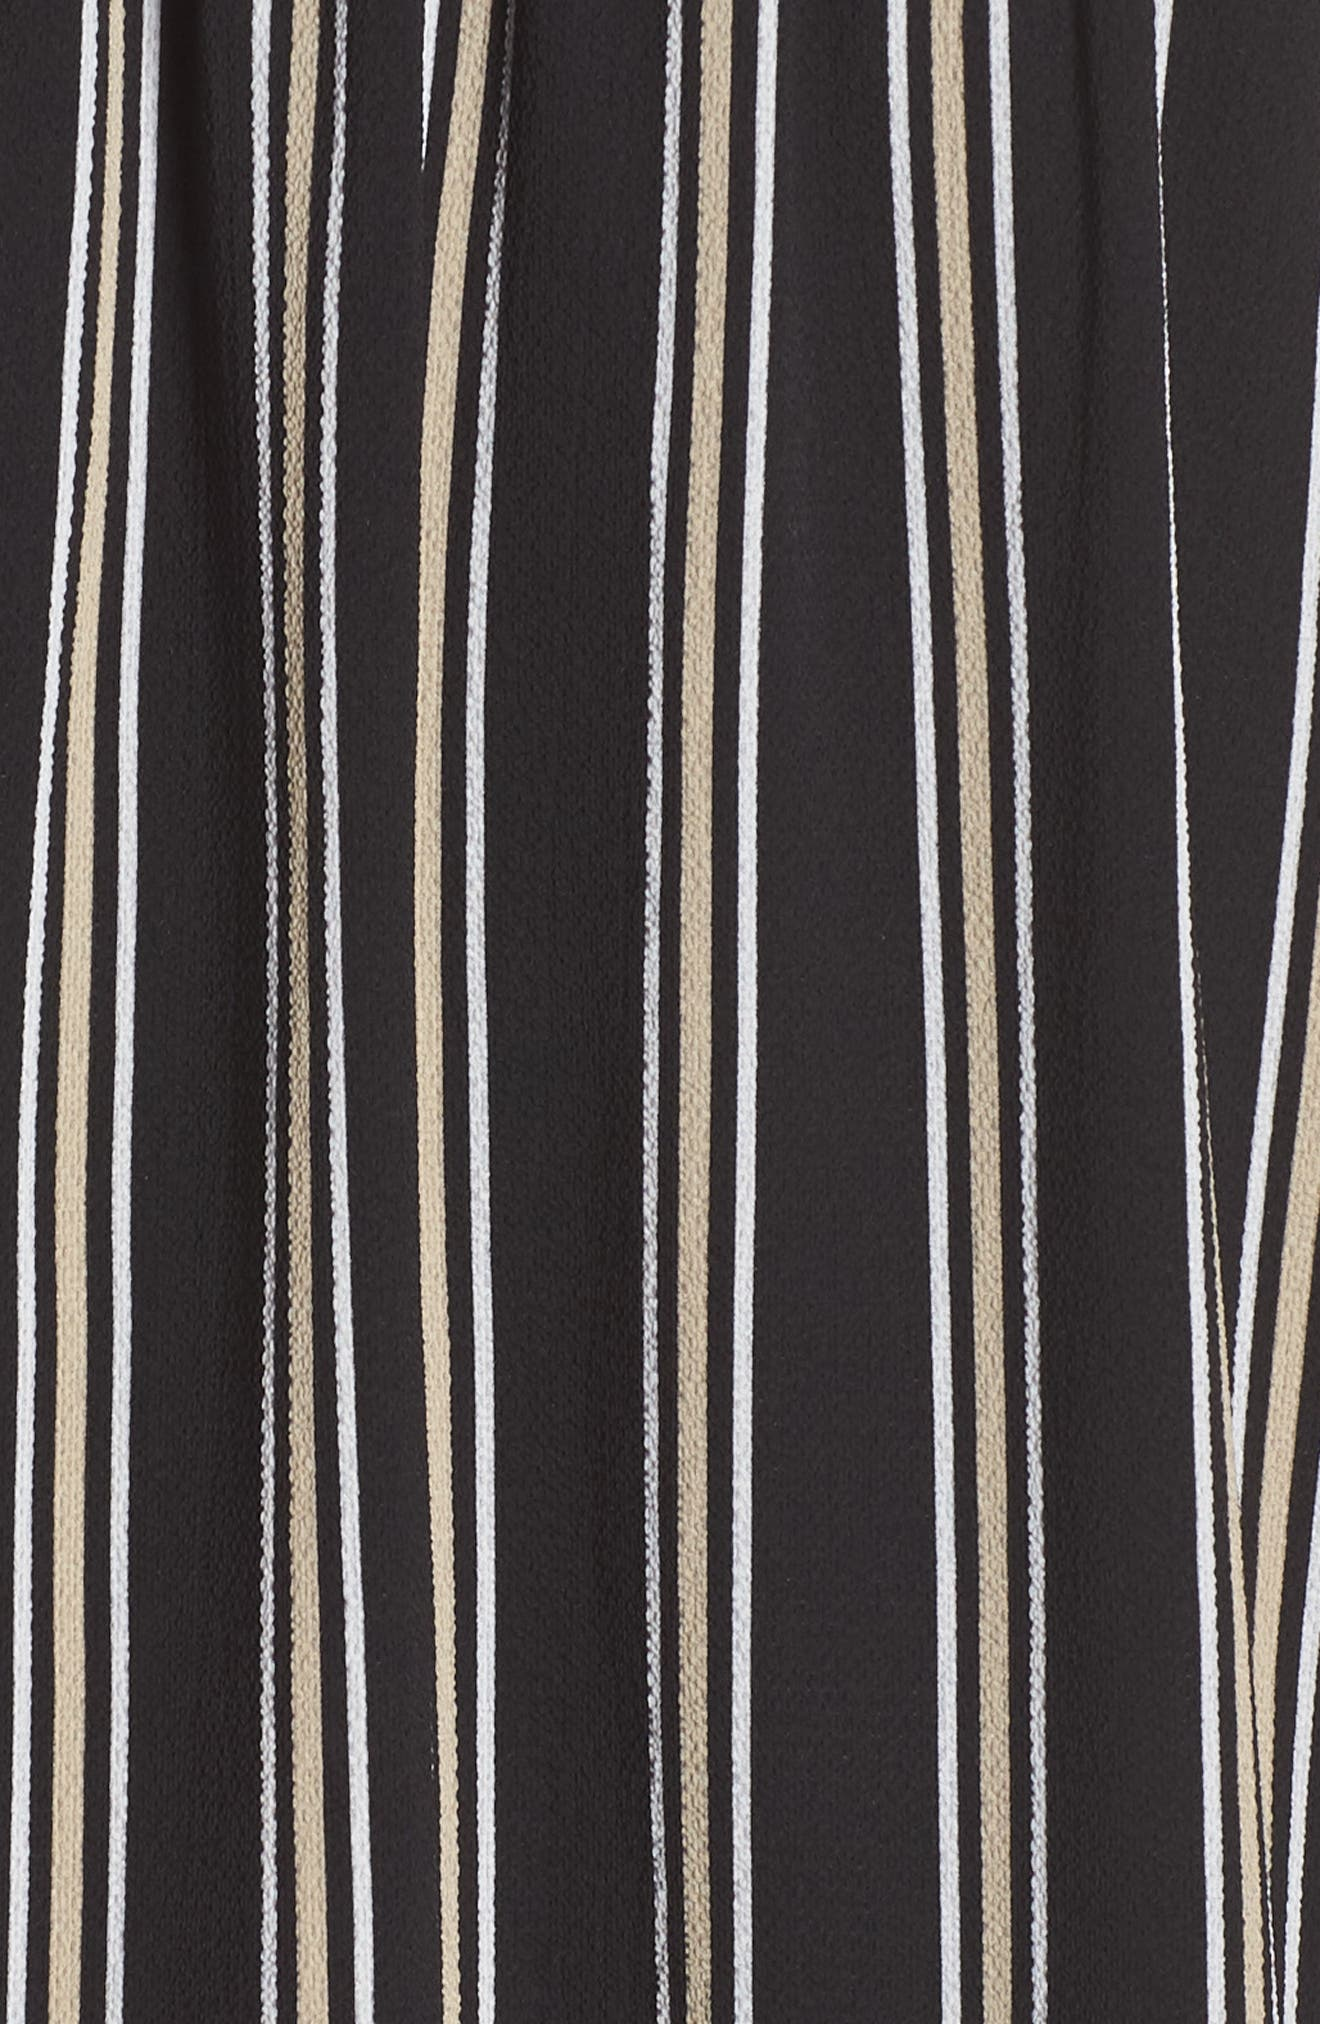 ALI & JAY, Tea for Two Crepe Dress, Alternate thumbnail 5, color, BLACK MULTI STRIPE